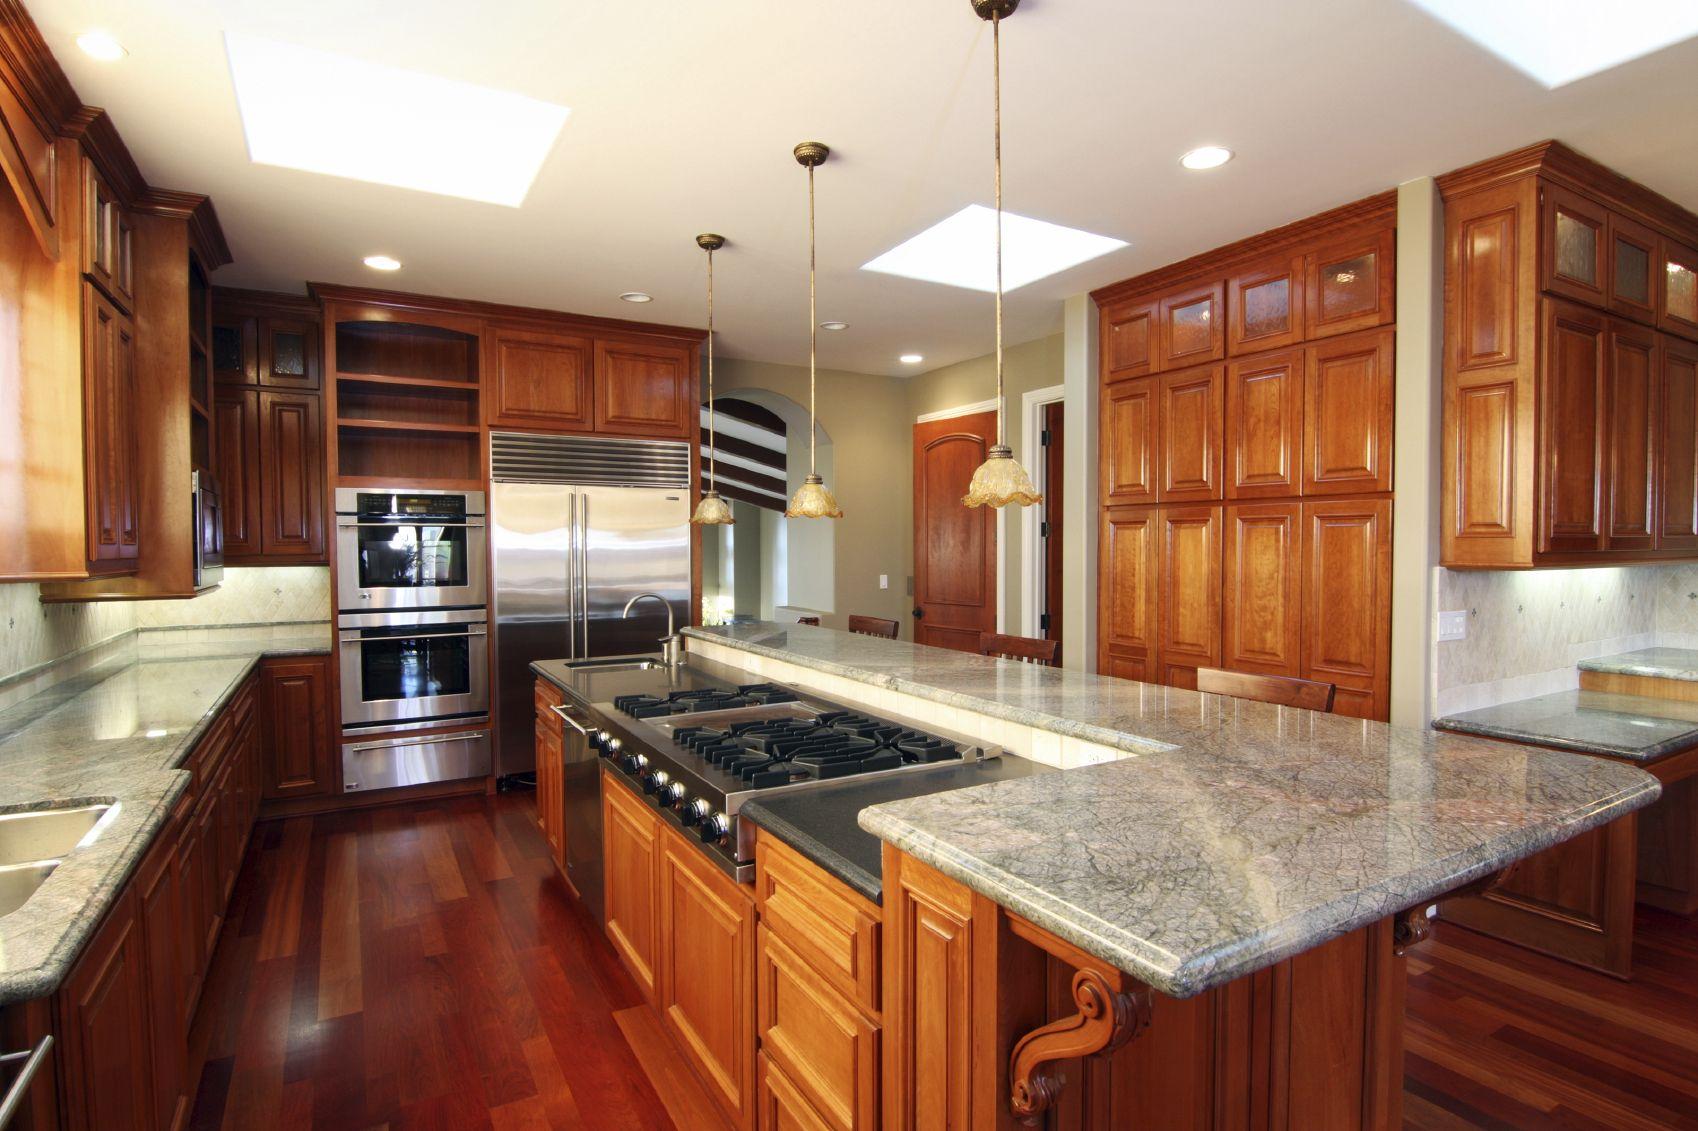 90 Different Kitchen Island Ideas And Designs Photos Kitchen Island With Stove Kitchen Island With Sink And Dishwasher Kitchen Island With Sink